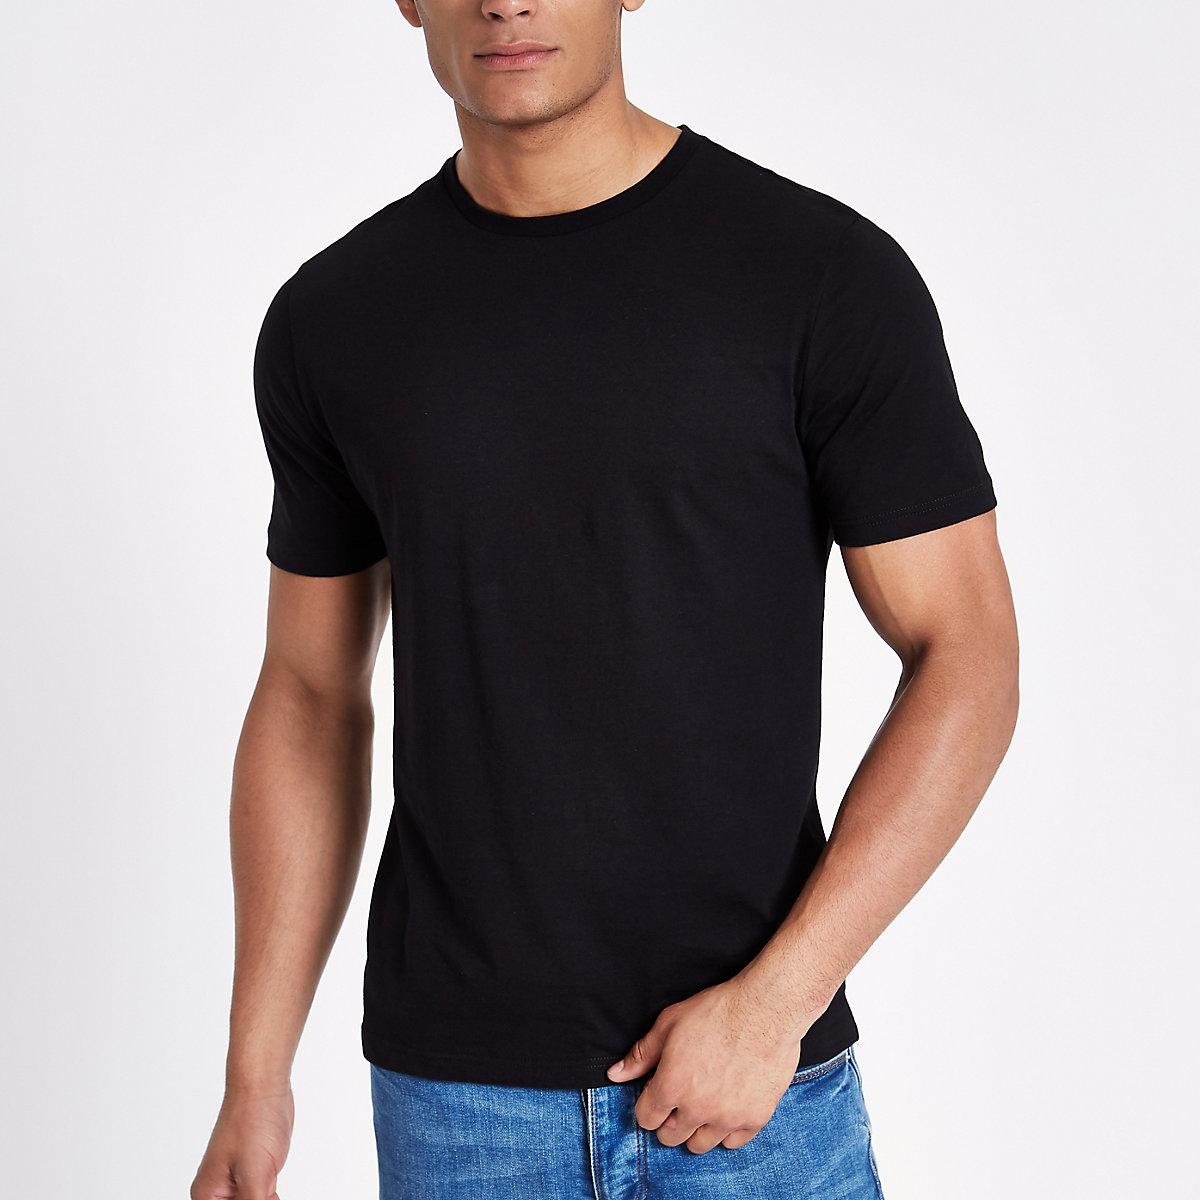 Black slim fit crew neck T-shirt